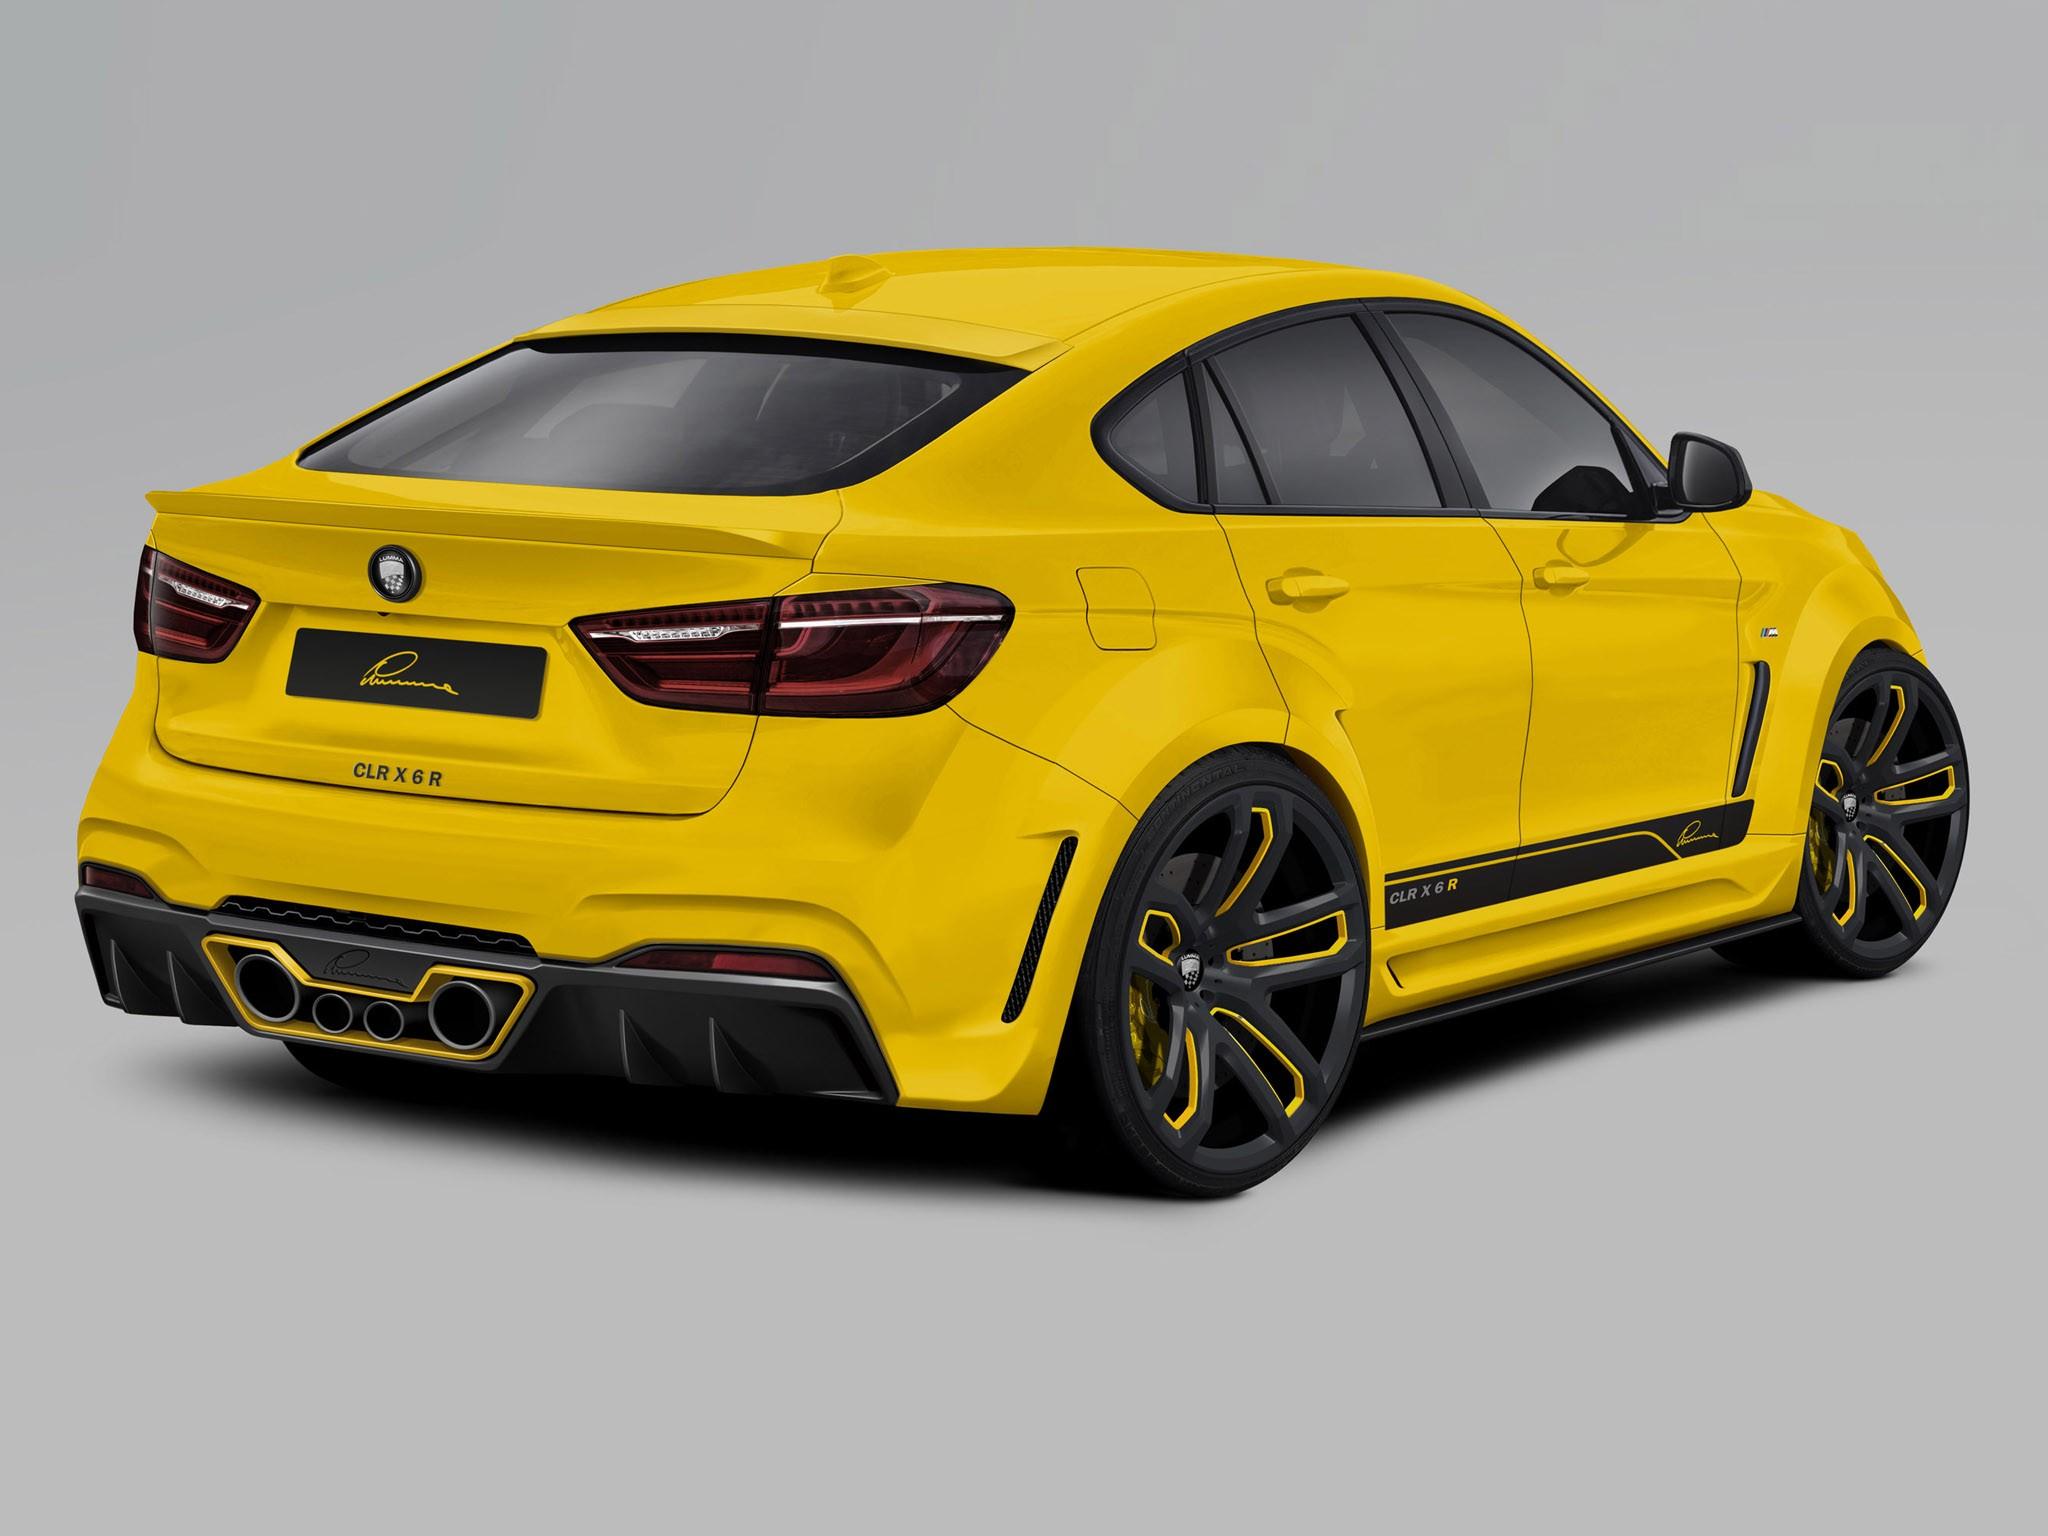 2014 Lumma Design - Bmw X6 CLR R